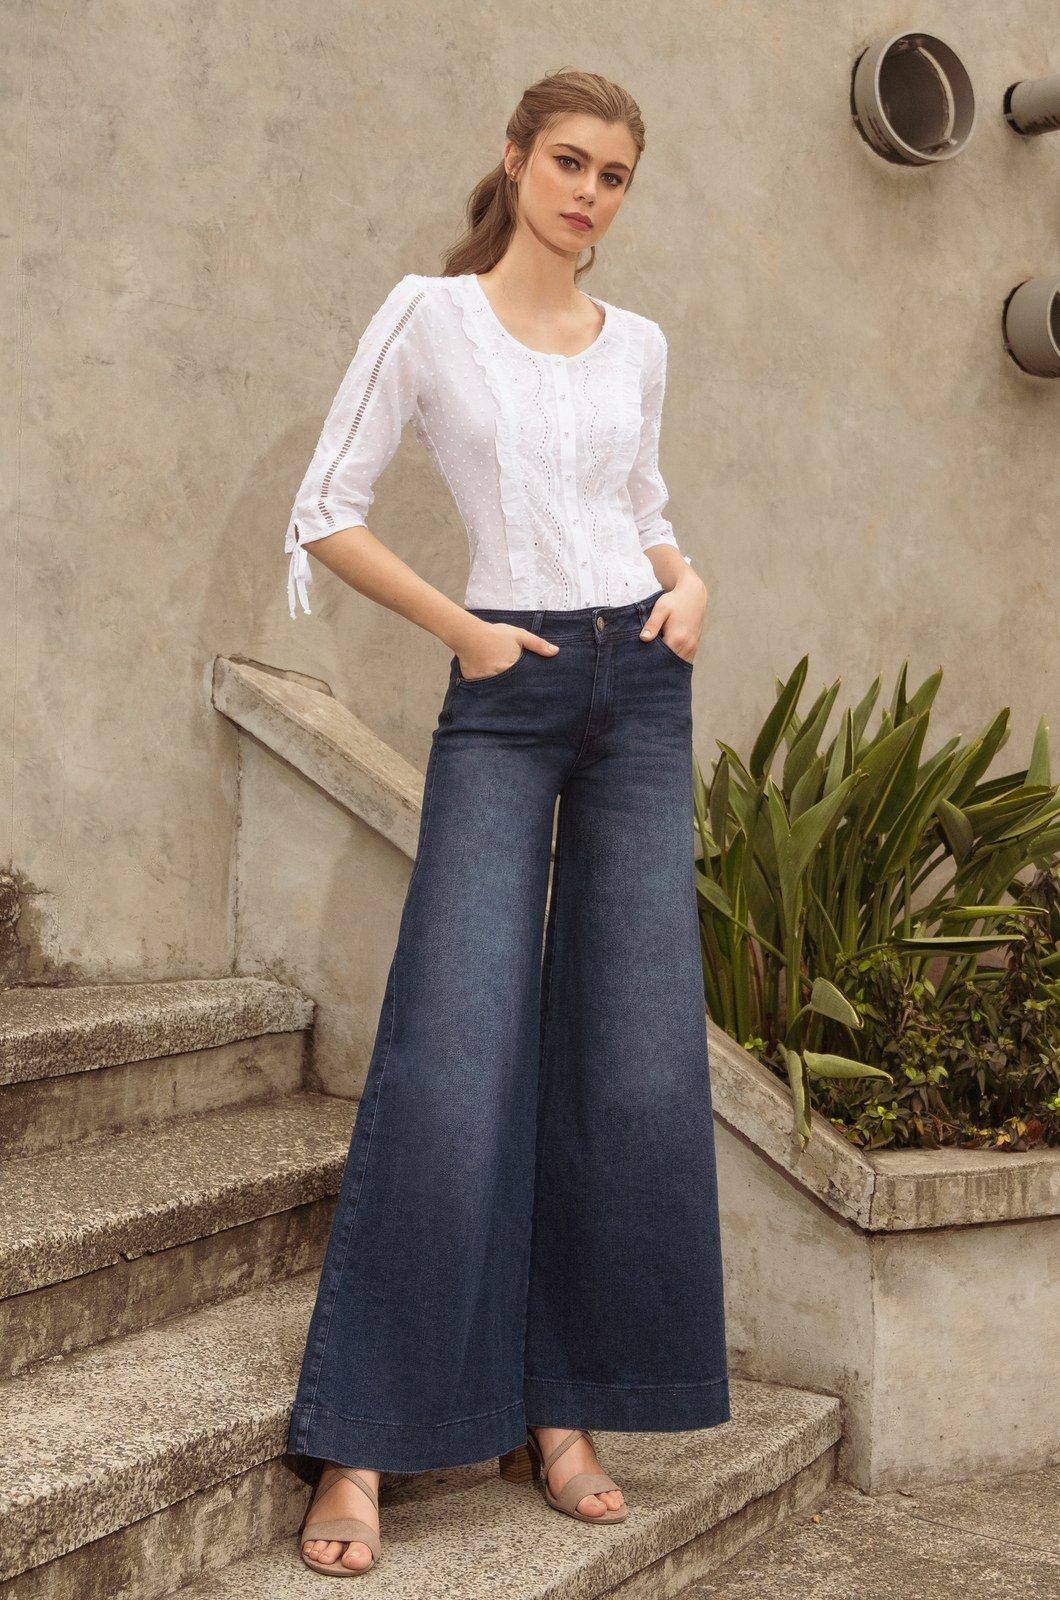 REF 1310-9 Jeans palazzo